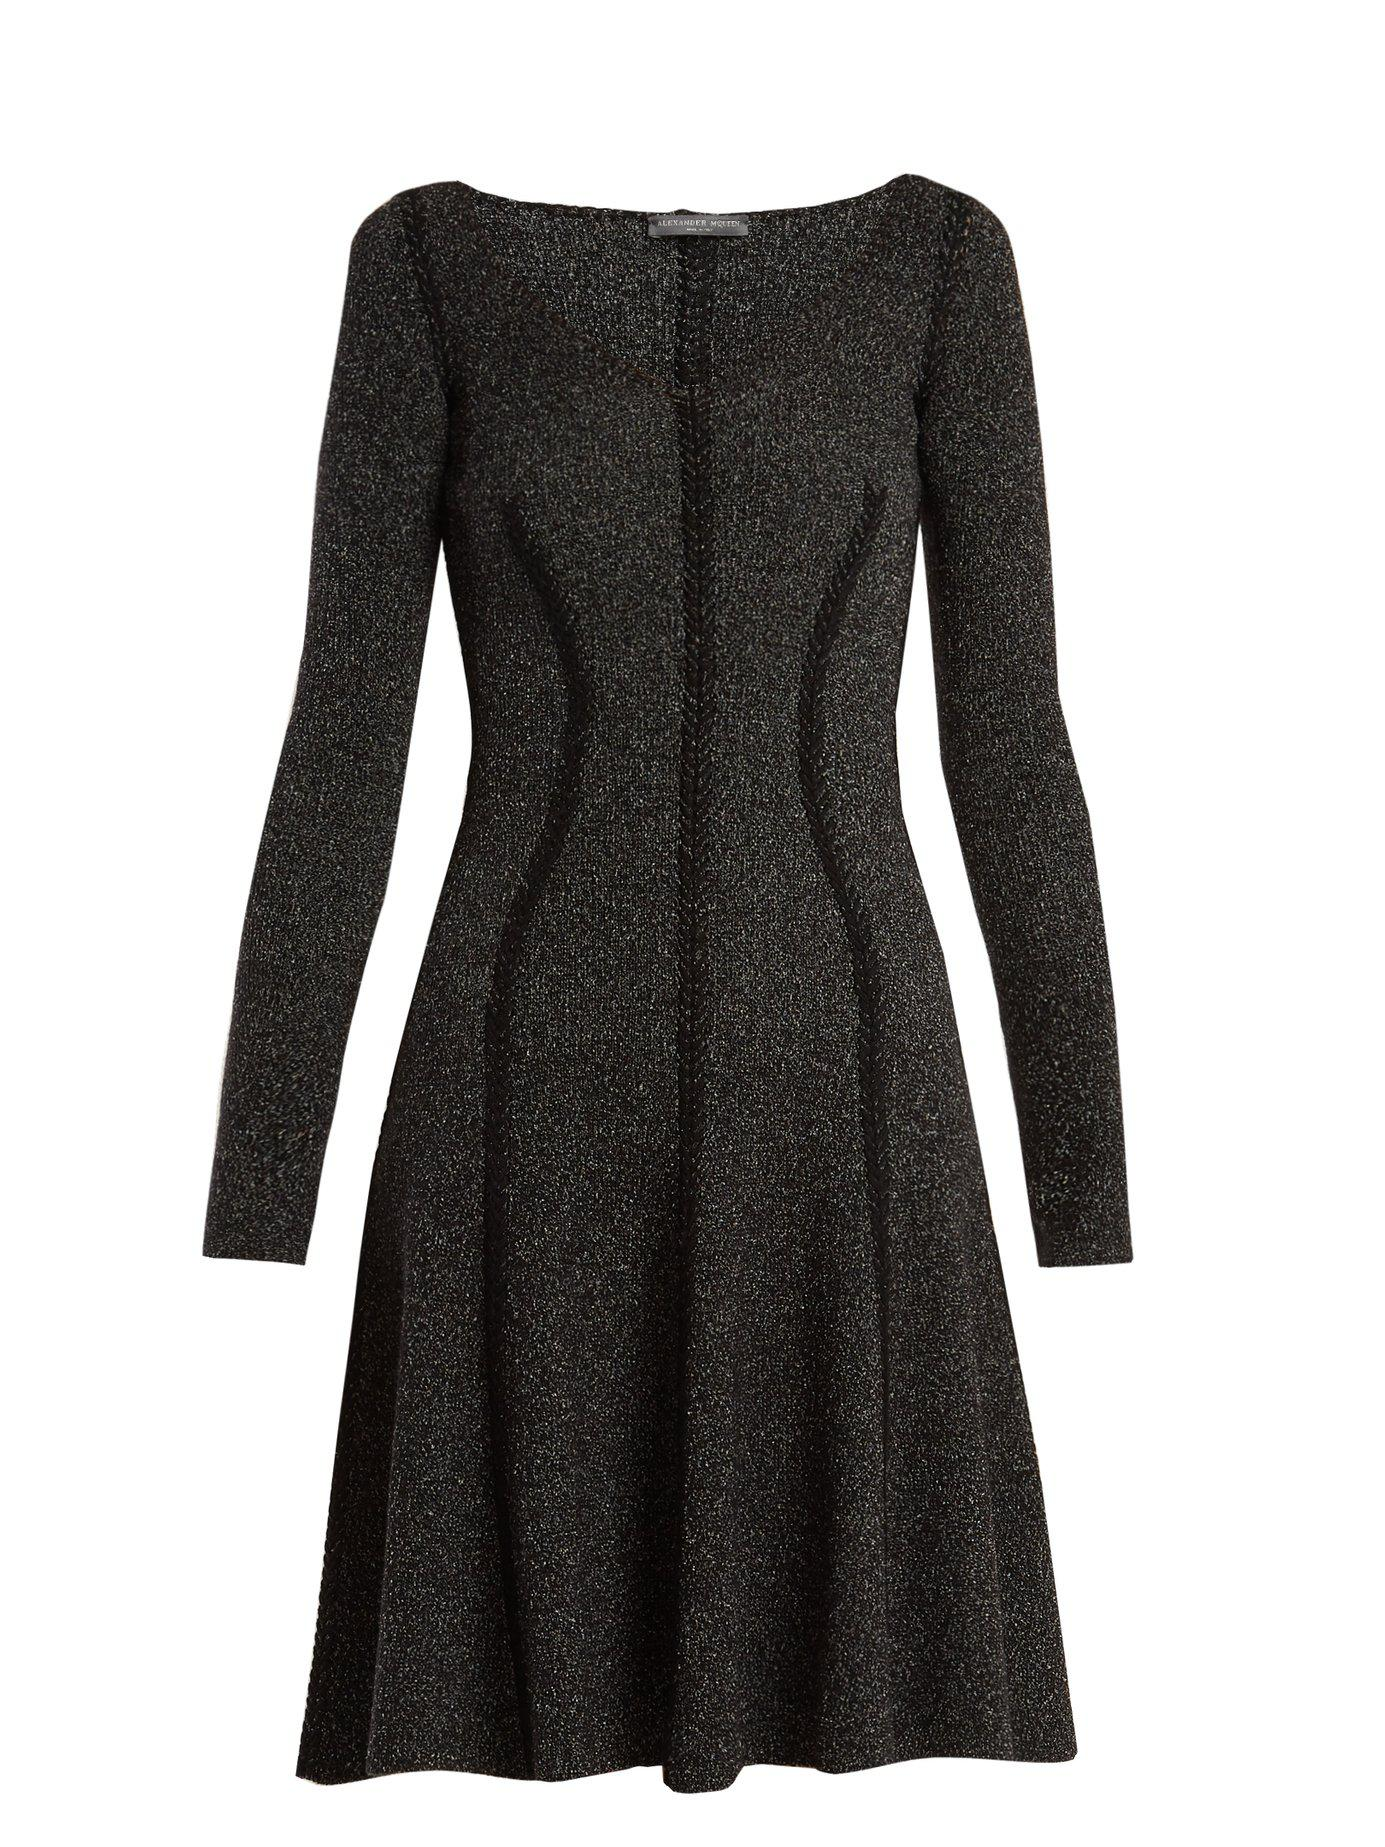 1fe3d639543 Alexander McQueen. Women s Black Speckled Flared Skirt Ribbed Knit Dress